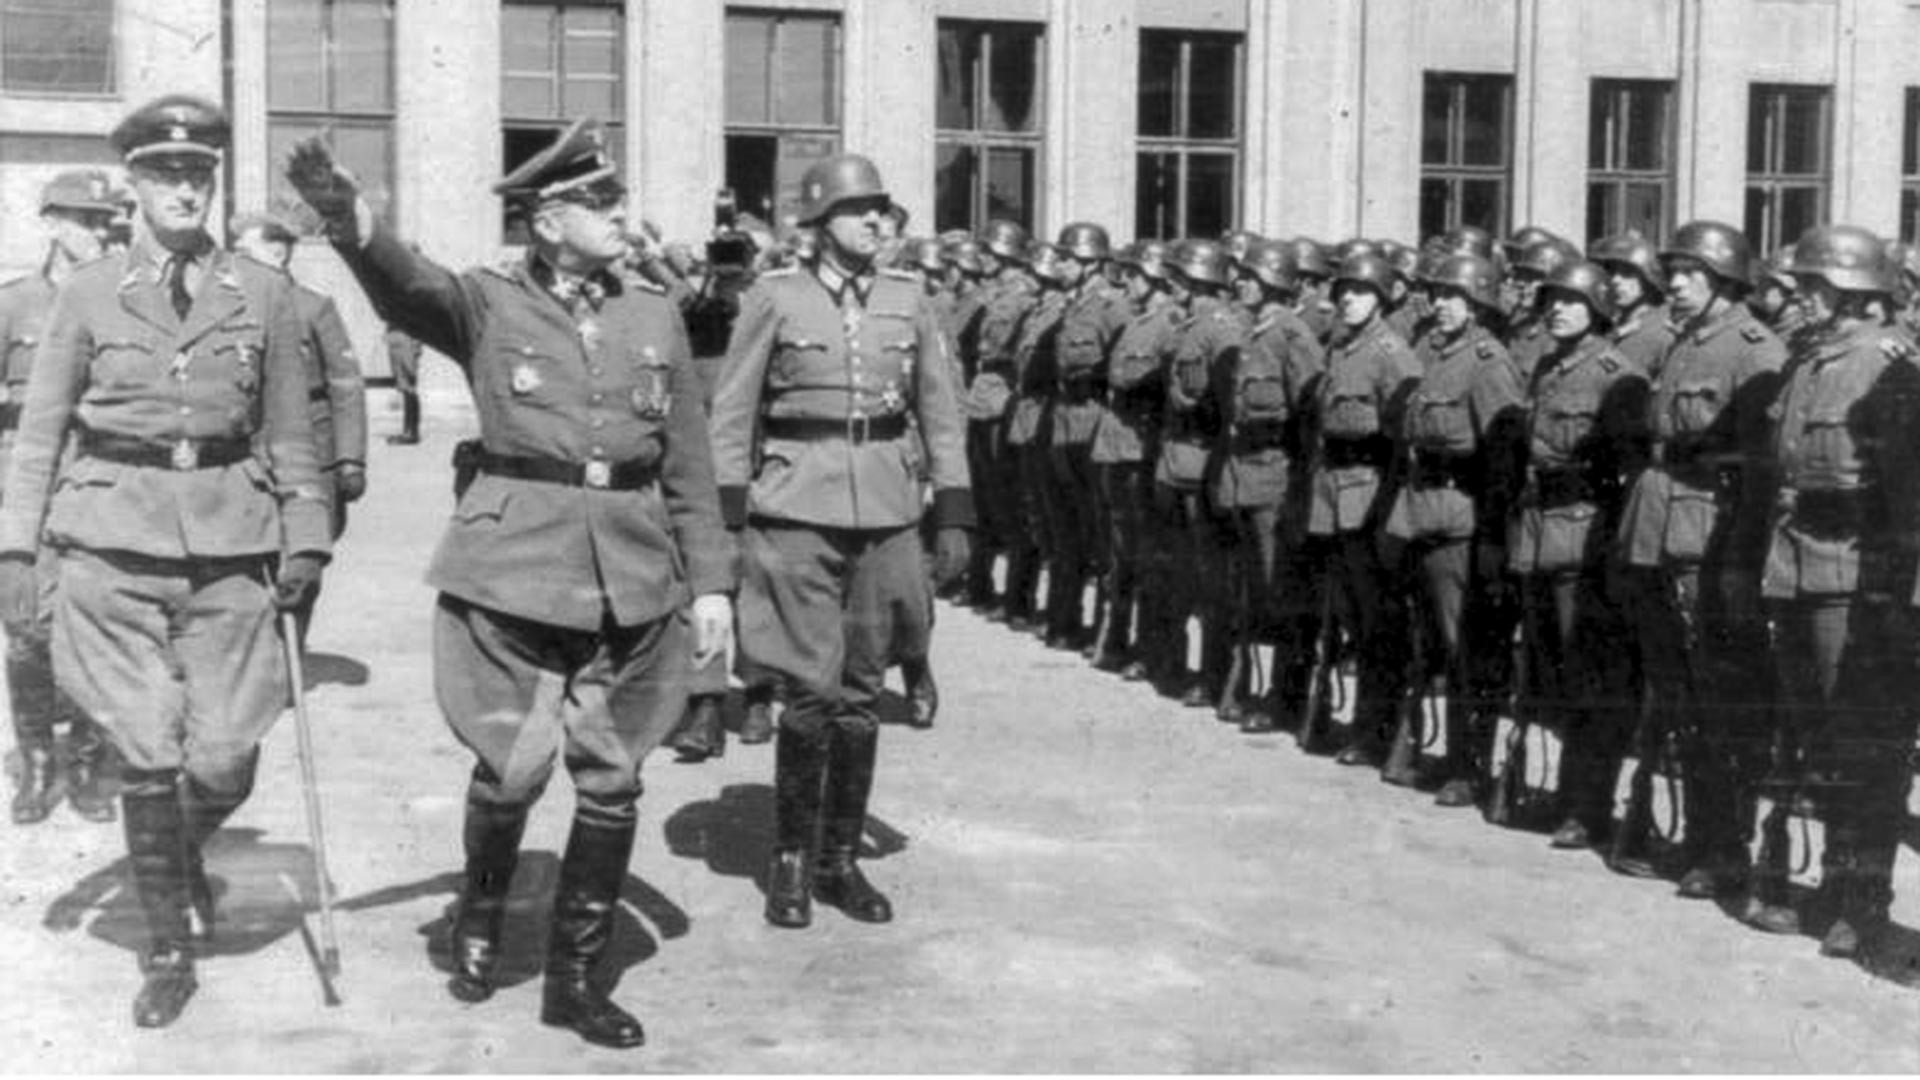 SSSR, Minsk. Parada Ordnungspolizeia (uniformirane njemačke civilne policije) na Trgu Lenjina (ranije Trg neovisnosti).